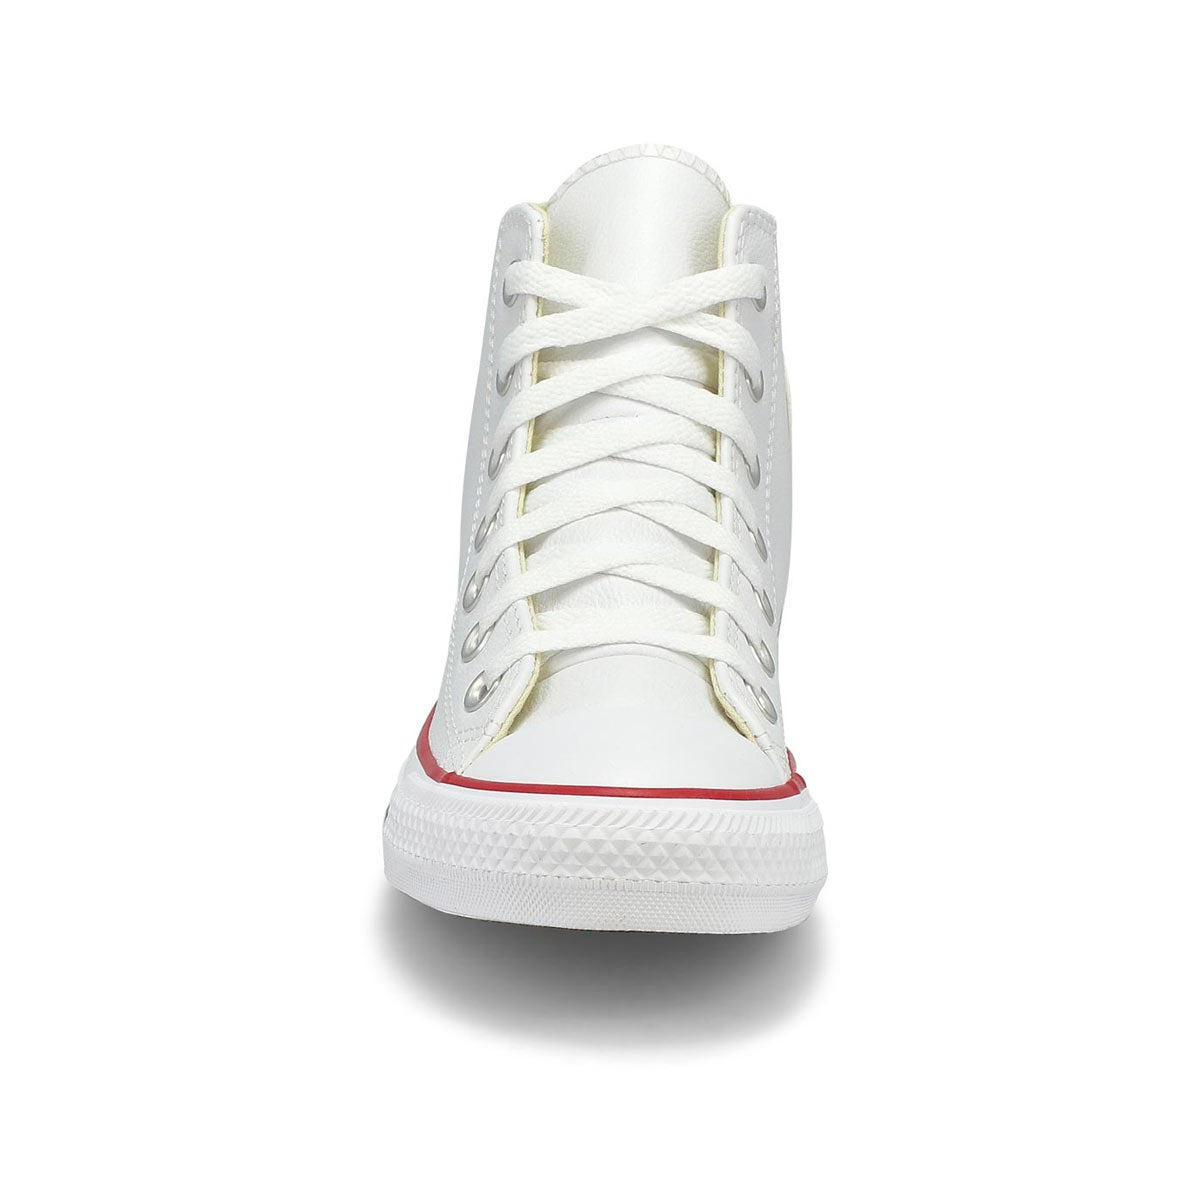 Men's All Star Leather Hi Top Sneaker - White